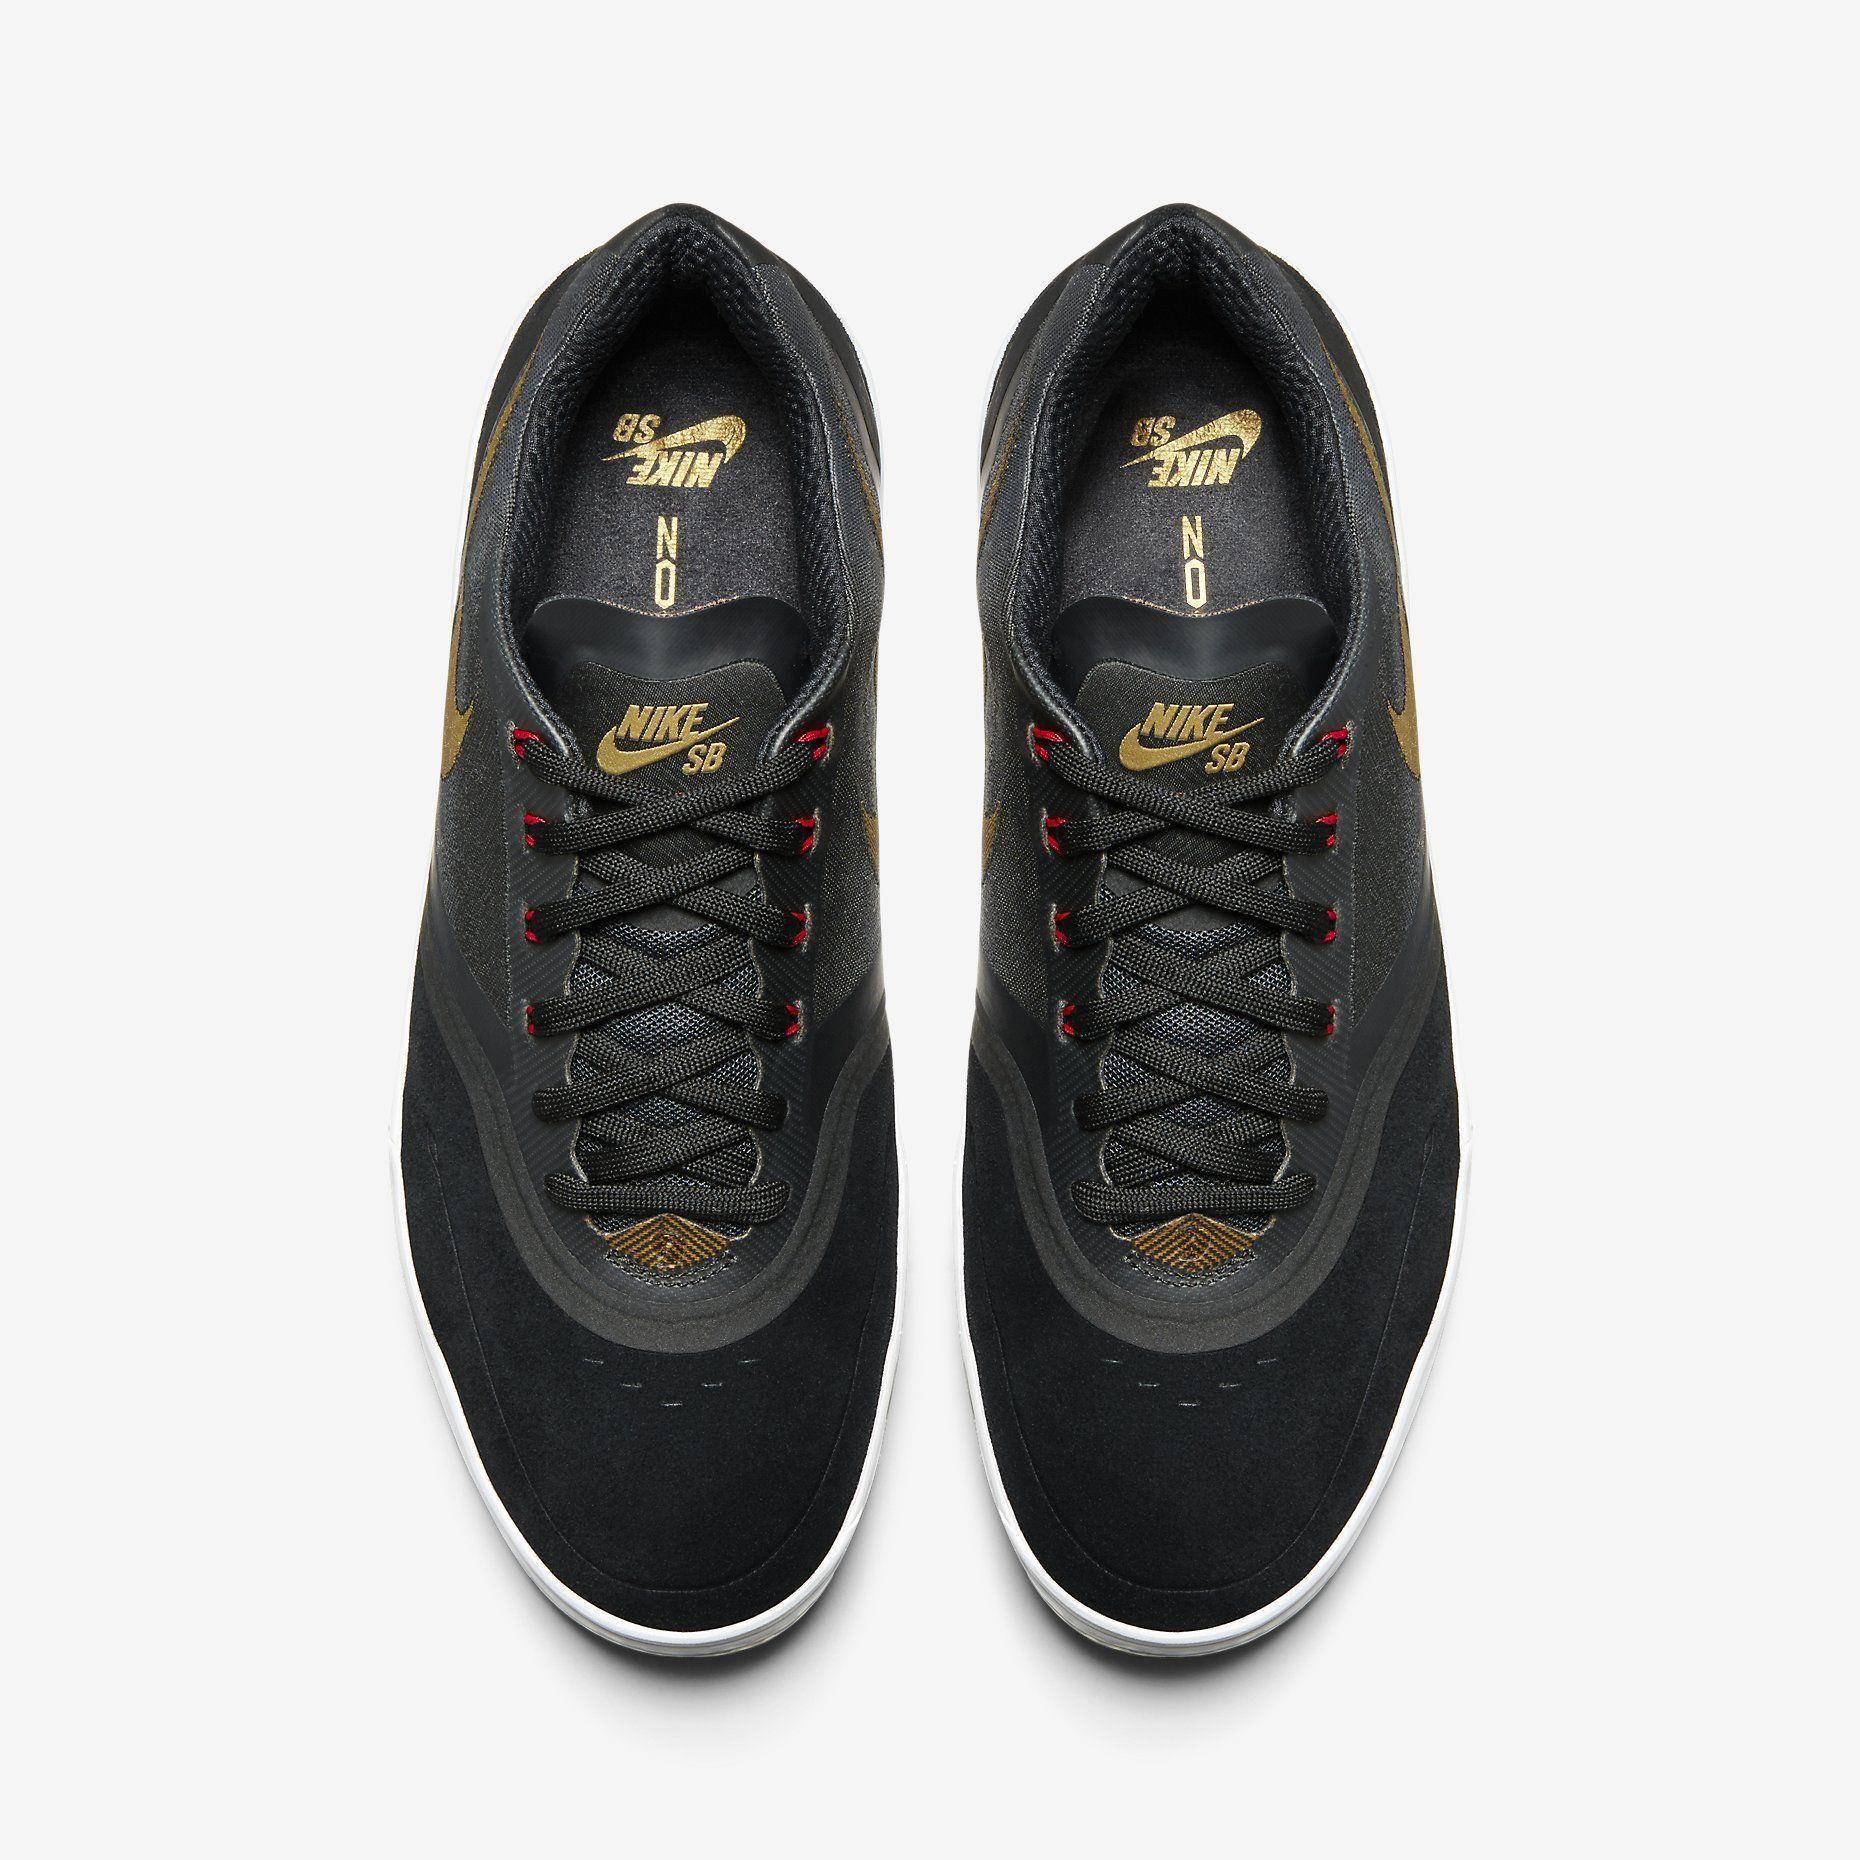 Nike SB Paul Rodriguez 9 Elite Zapatillas de skate - Hombre. Nike Store ES